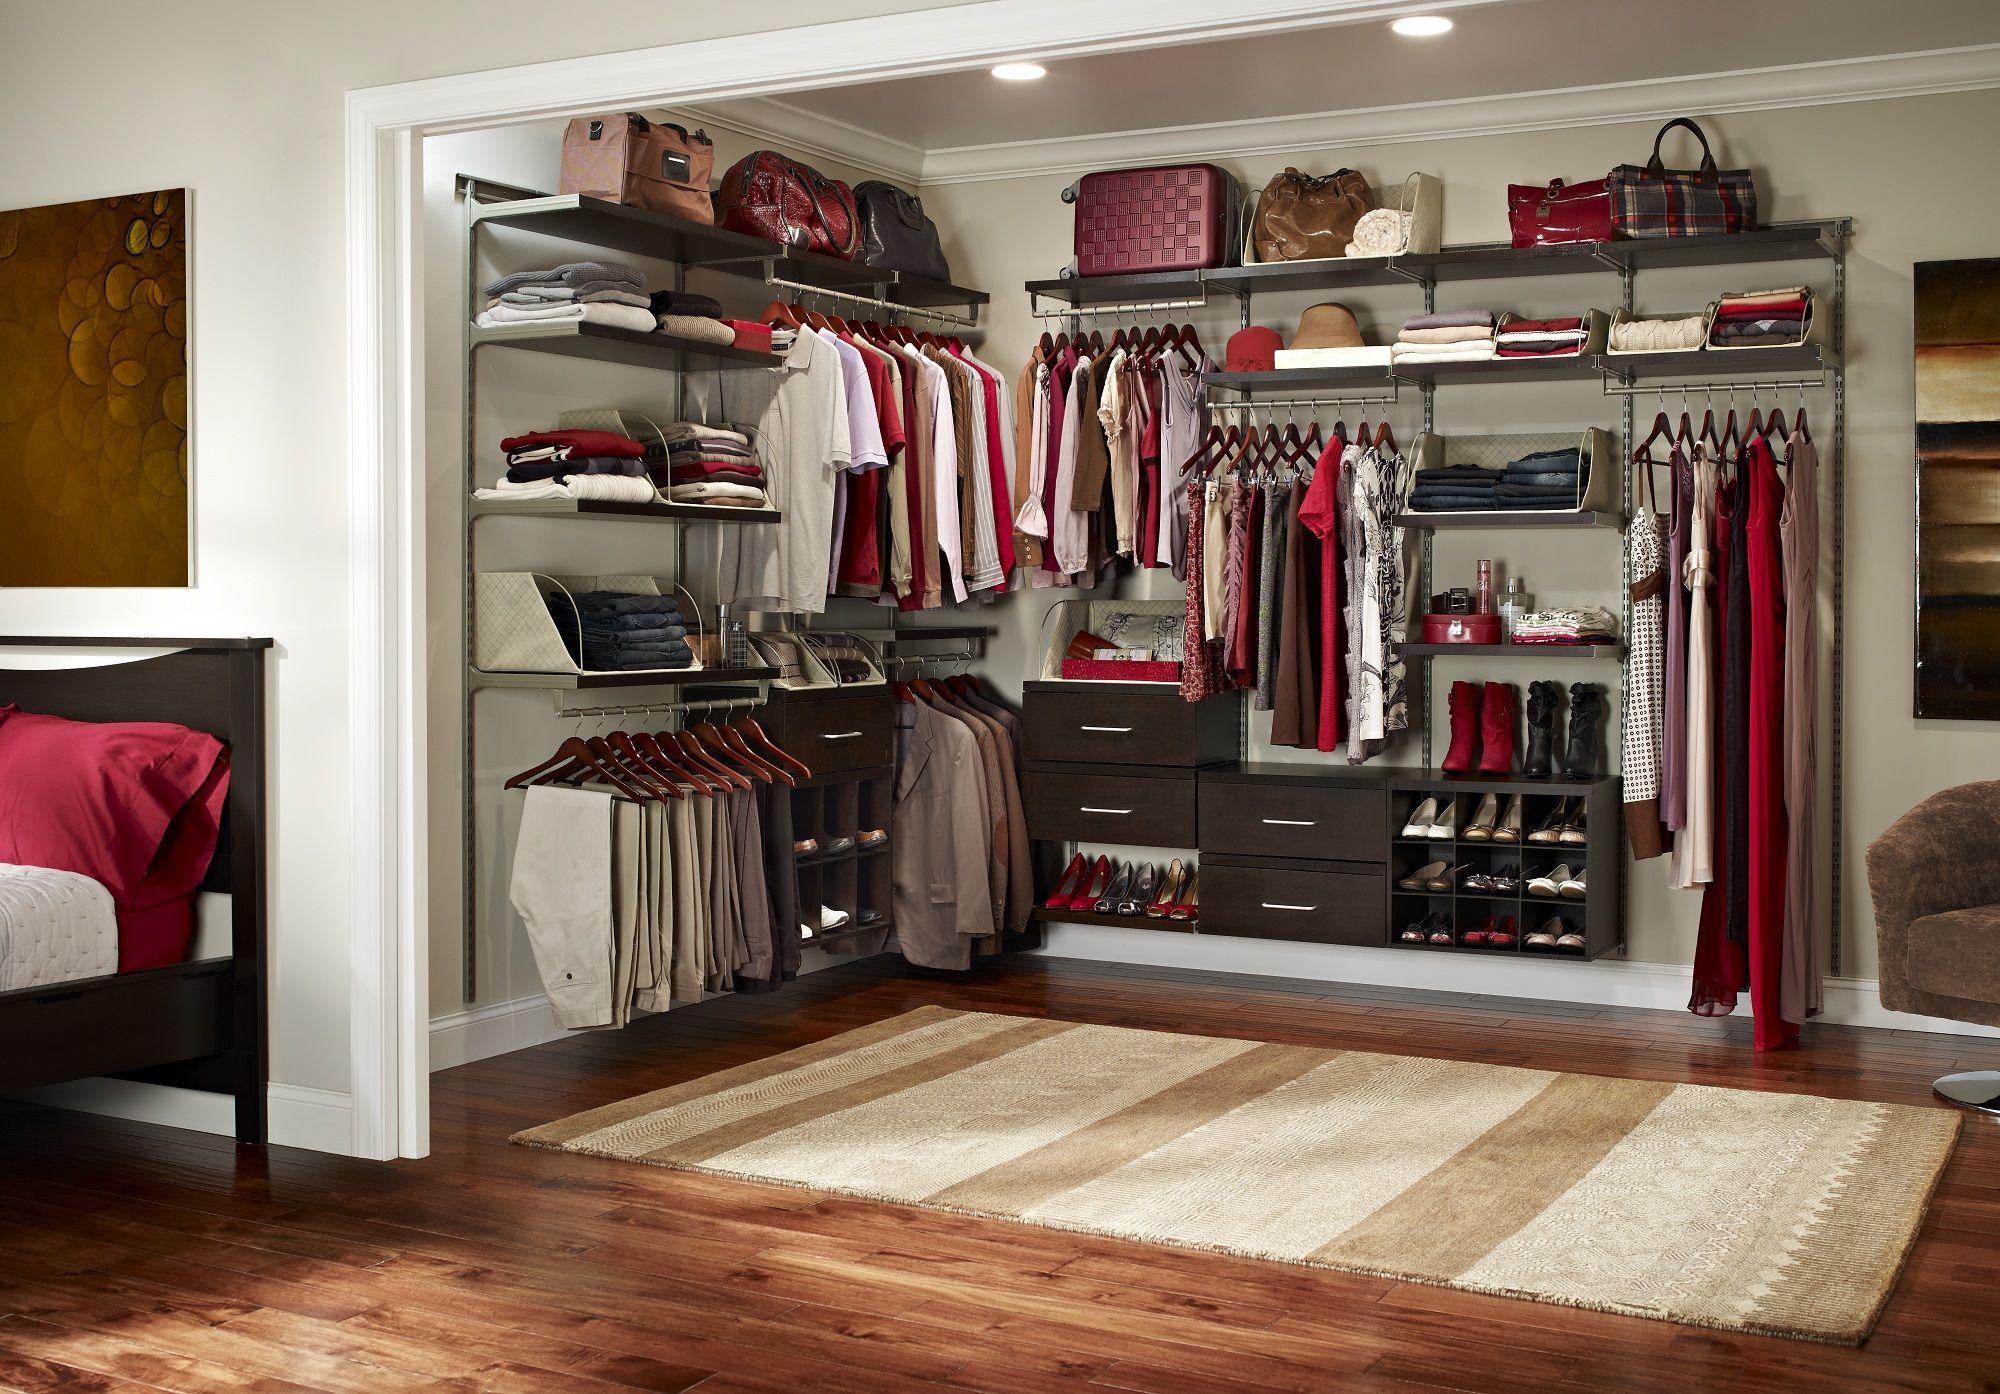 Closet Organization At Lowe S Canada Small Room Design Makeshift Closet Home